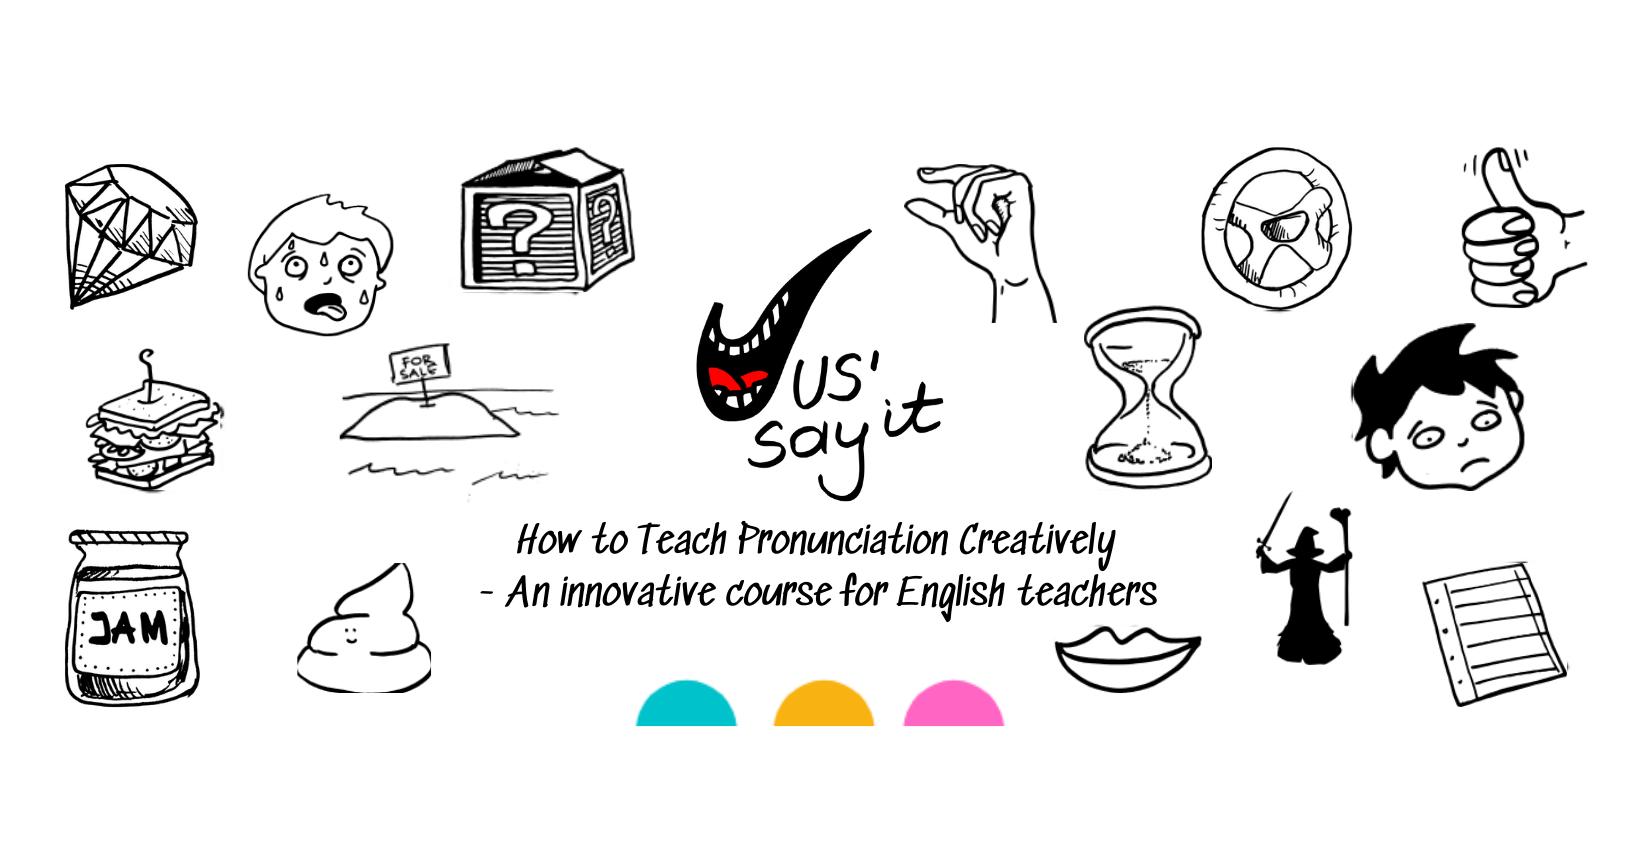 Jus' Say It - How to Teach Pronunciation Creatively